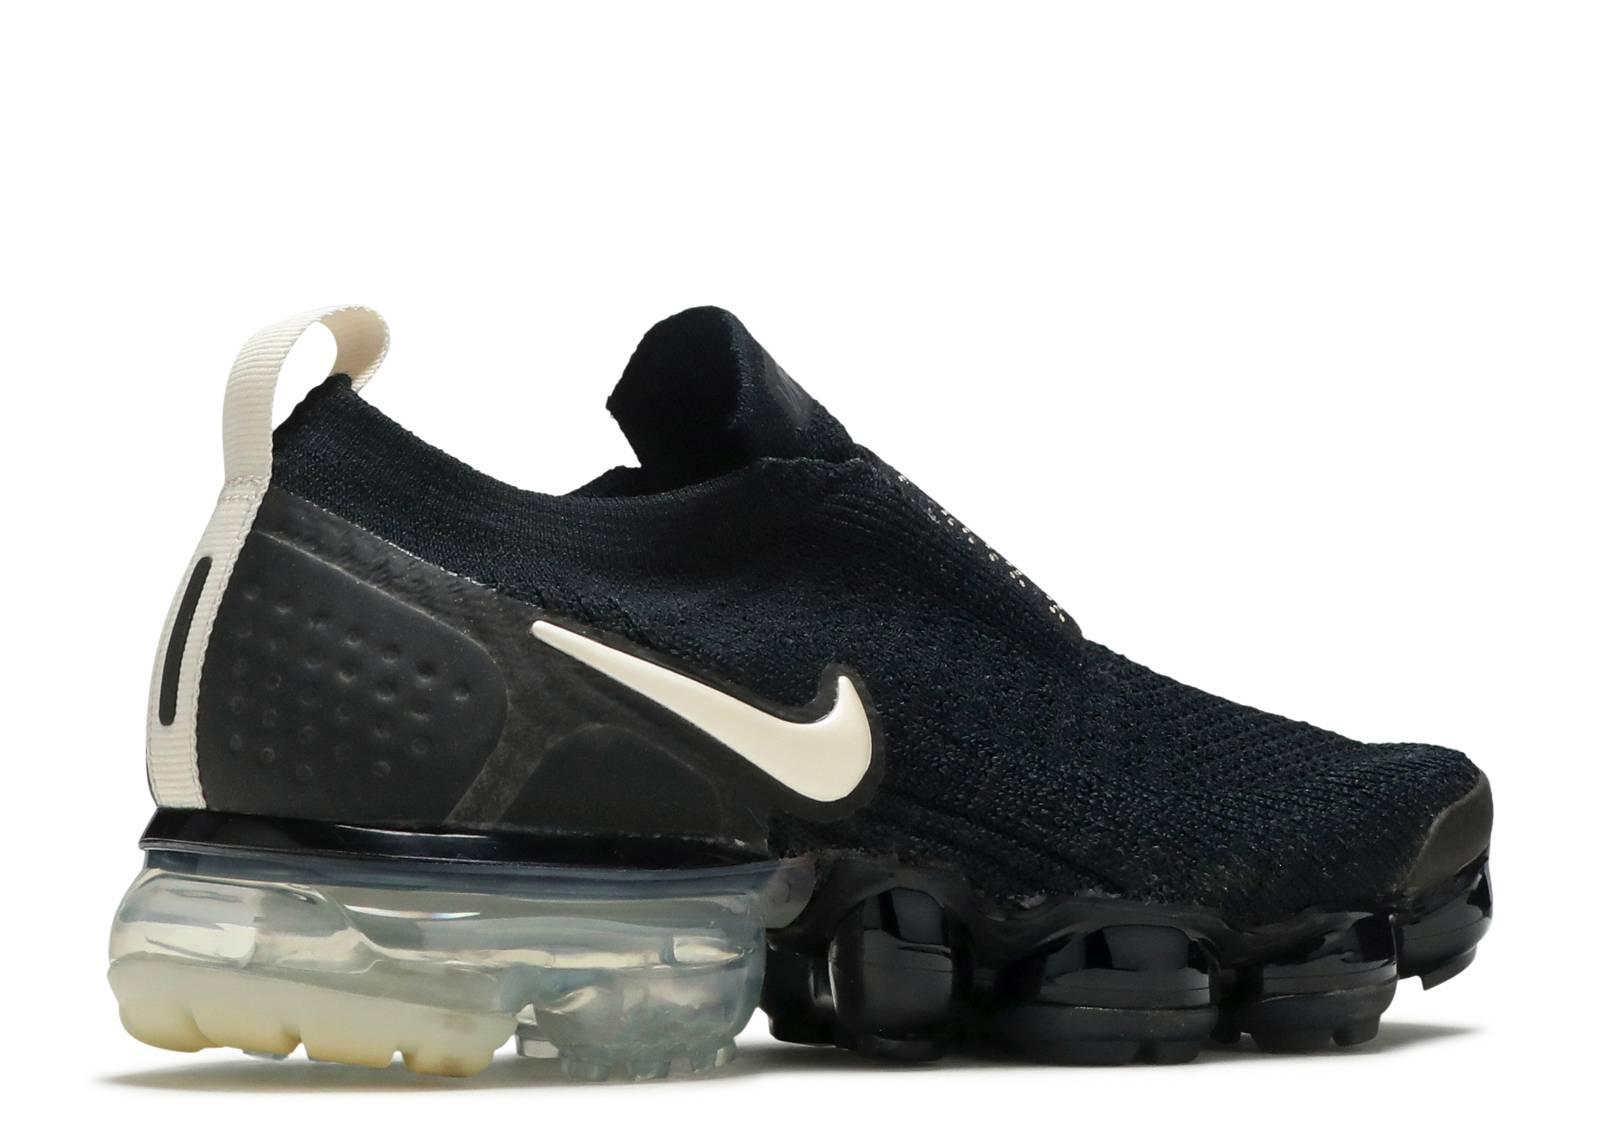 284910dc72b95 Wmns Air Vapormax Fk Moc 2 - Nike - aj6599 002 - black light cream-white